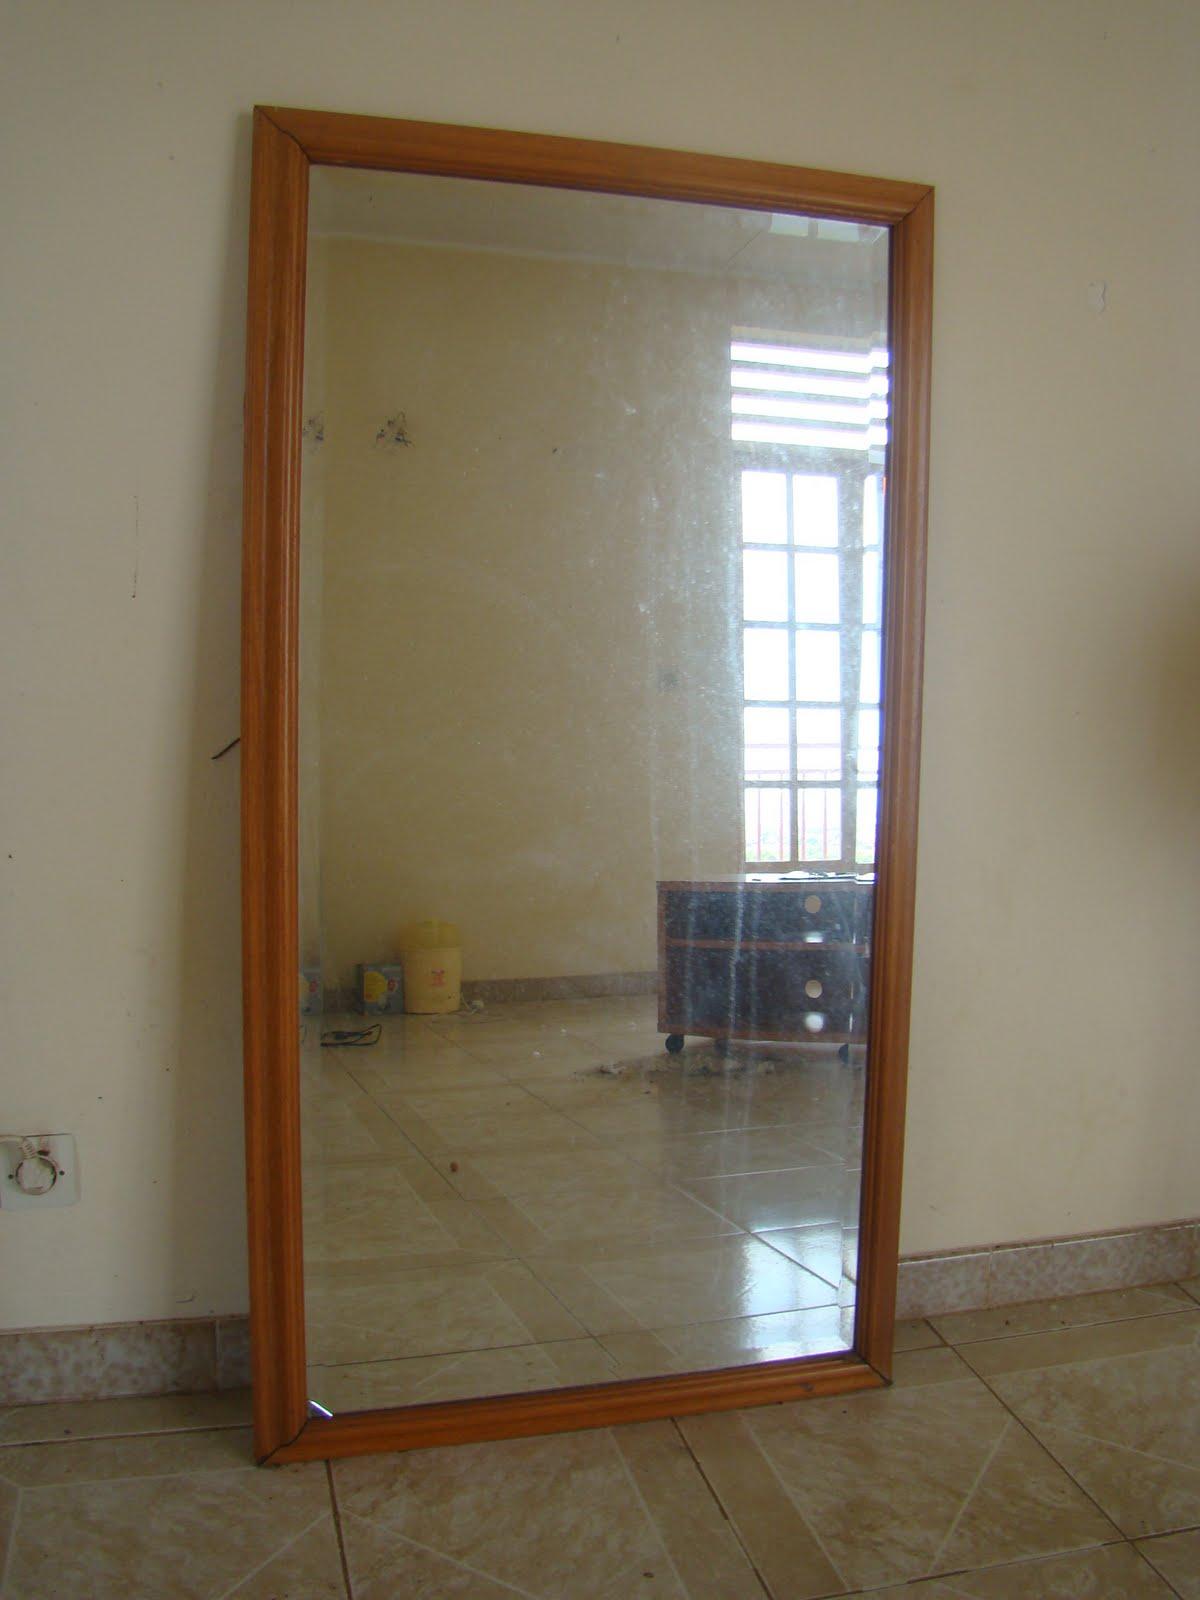 occaz 39 a vendre grand miroir mural. Black Bedroom Furniture Sets. Home Design Ideas